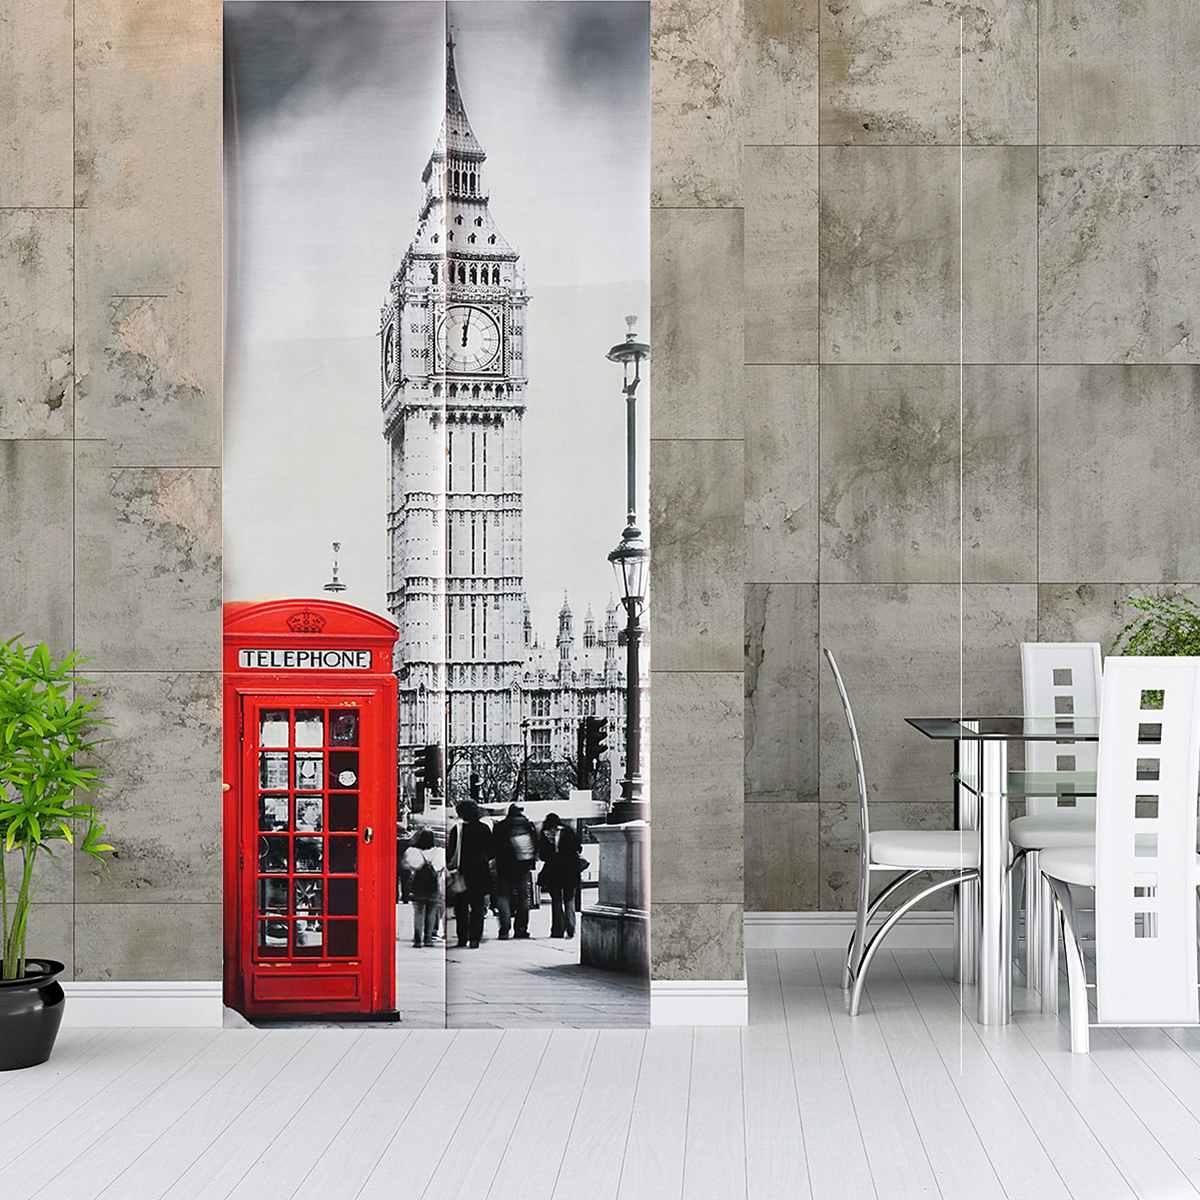 2pcs/set 3d Door Sticker Big Ben Telephone Booth 3d Art Door Wall Fridge Sticker Decal Self Adhesive Mural Home Decor Paste Home Decor